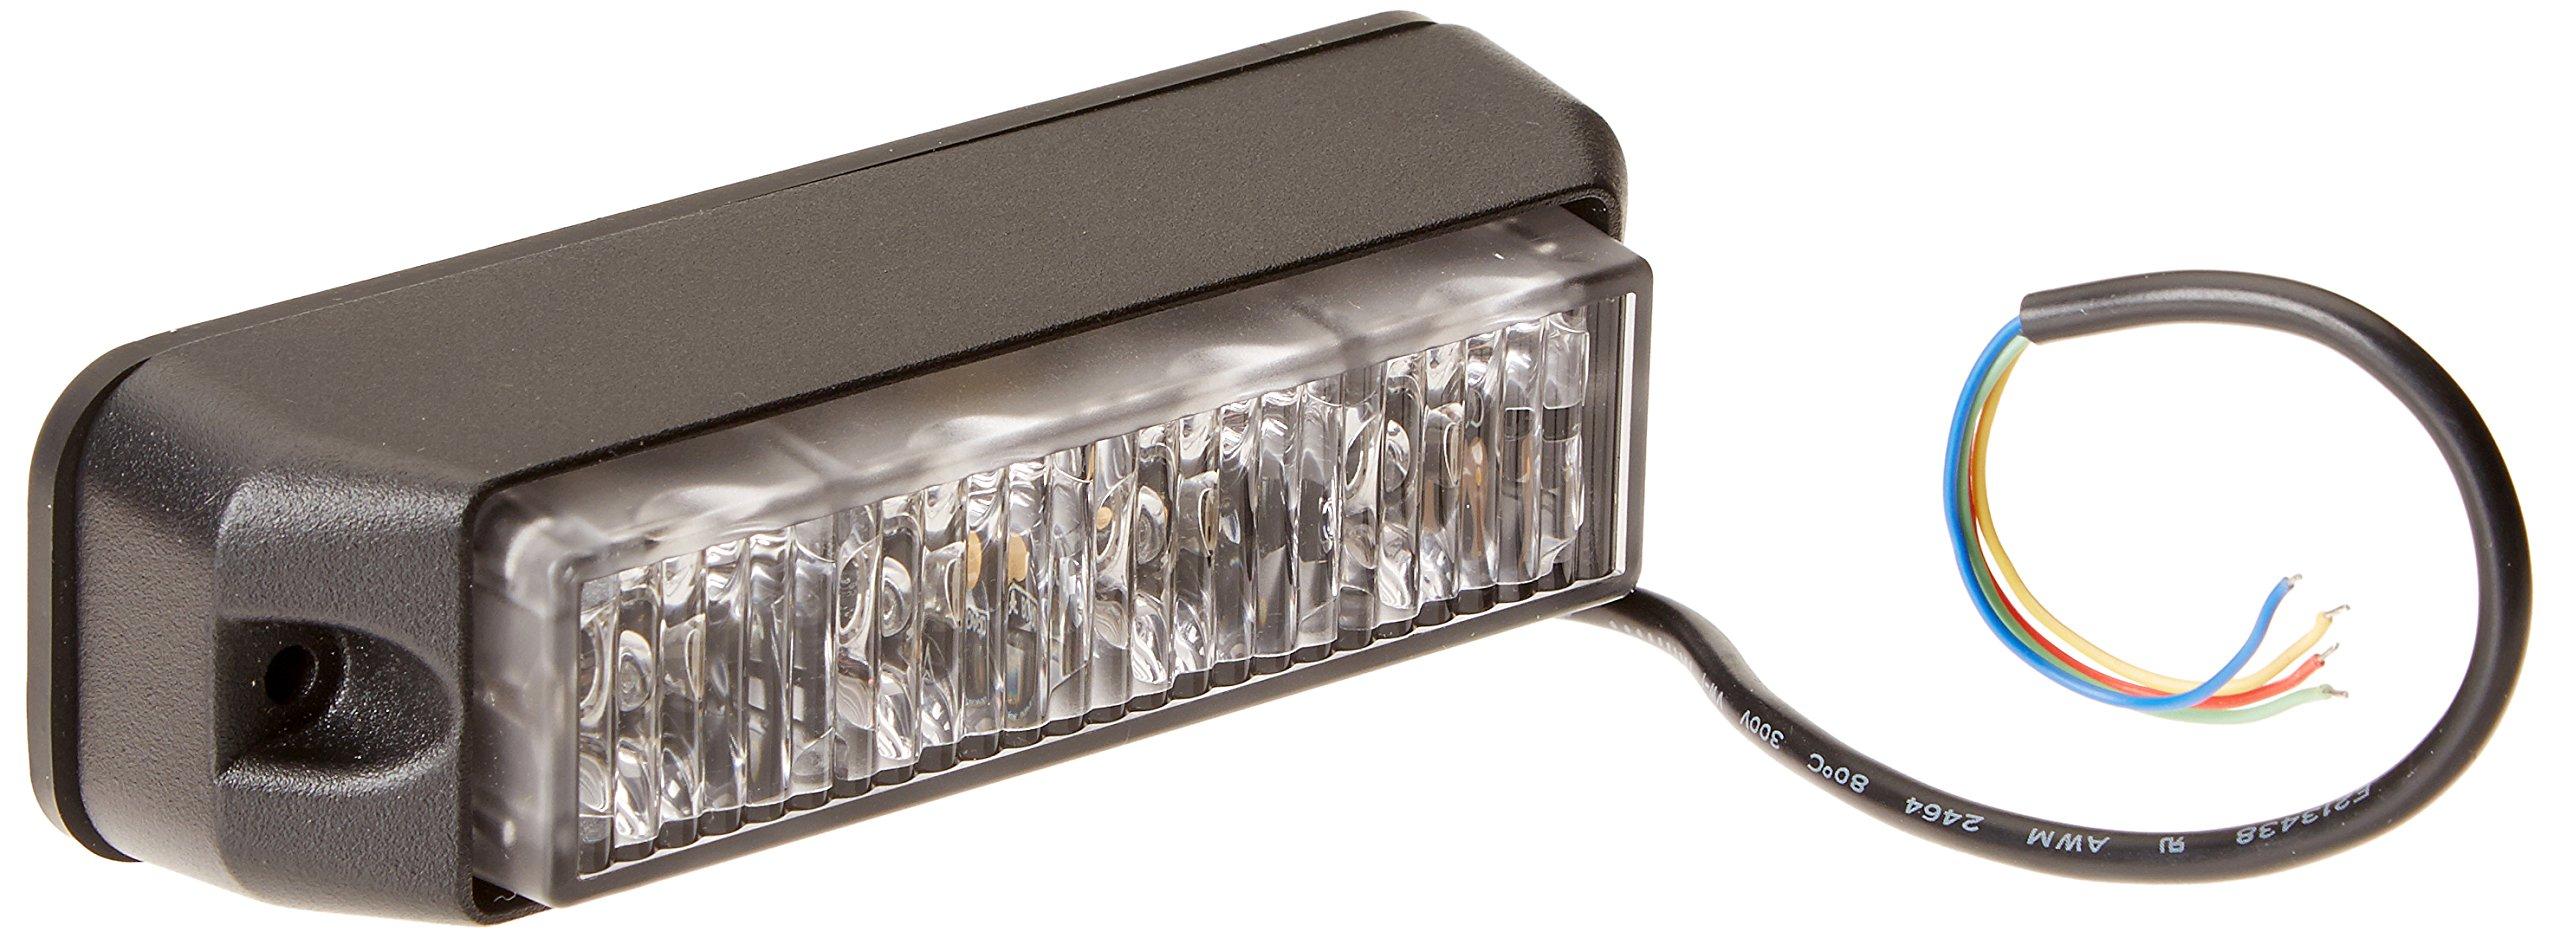 ECCO (3715C) Directional LED Light